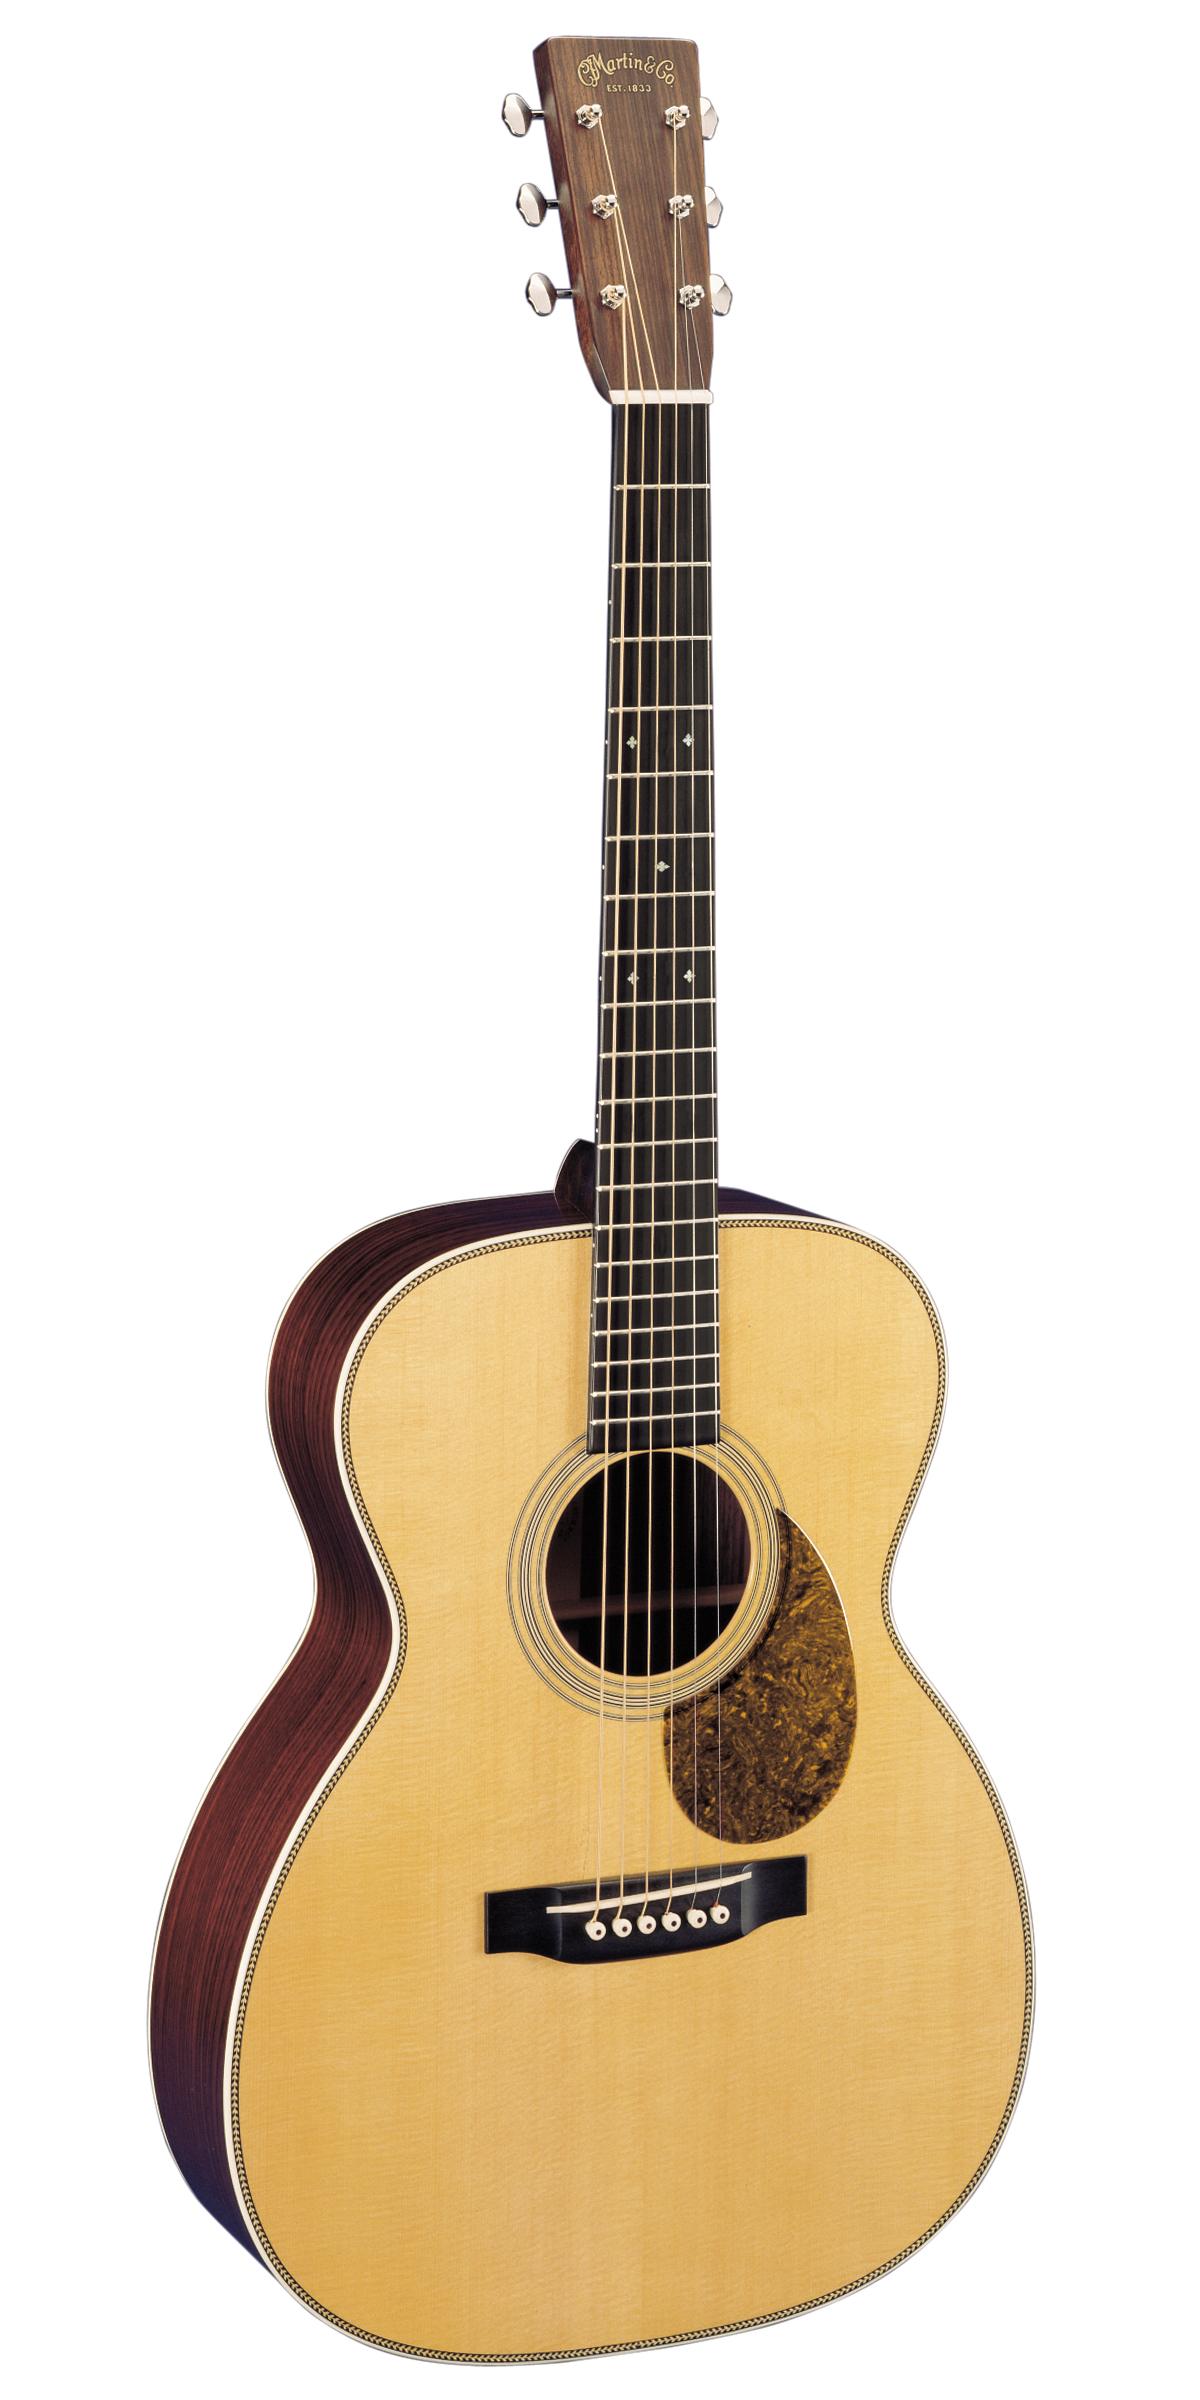 musicworks guitars acoustic guitars acoustic guitars martin acoustic guitar vintage w case. Black Bedroom Furniture Sets. Home Design Ideas